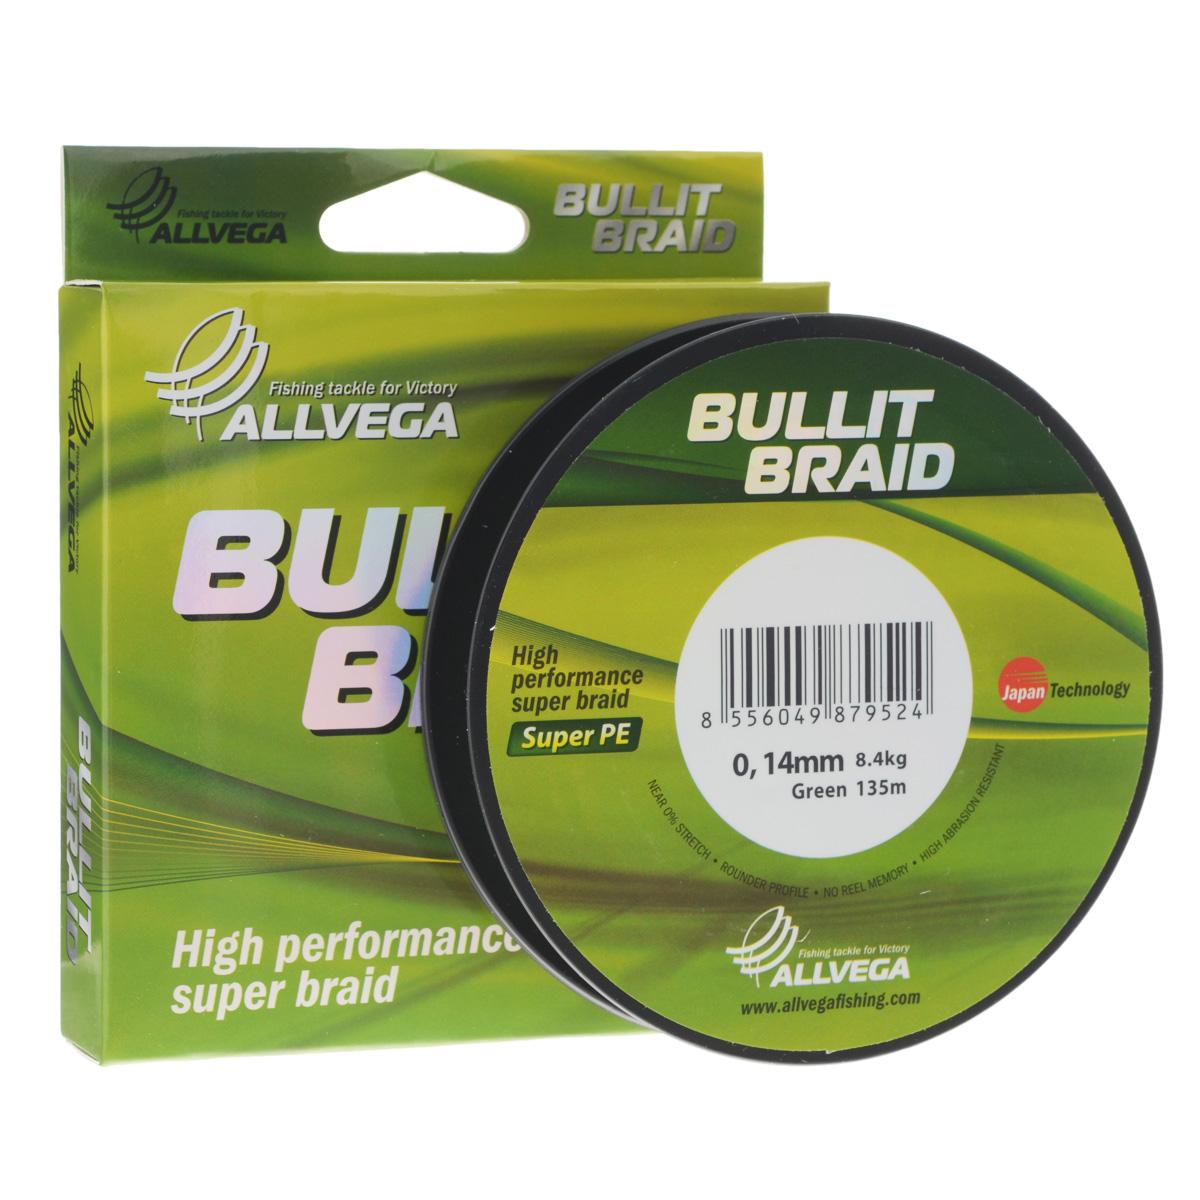 Леска плетеная Allvega Bullit Braid, цвет: темно-зеленый, 135 м, 0,14 мм, 8,4 кг